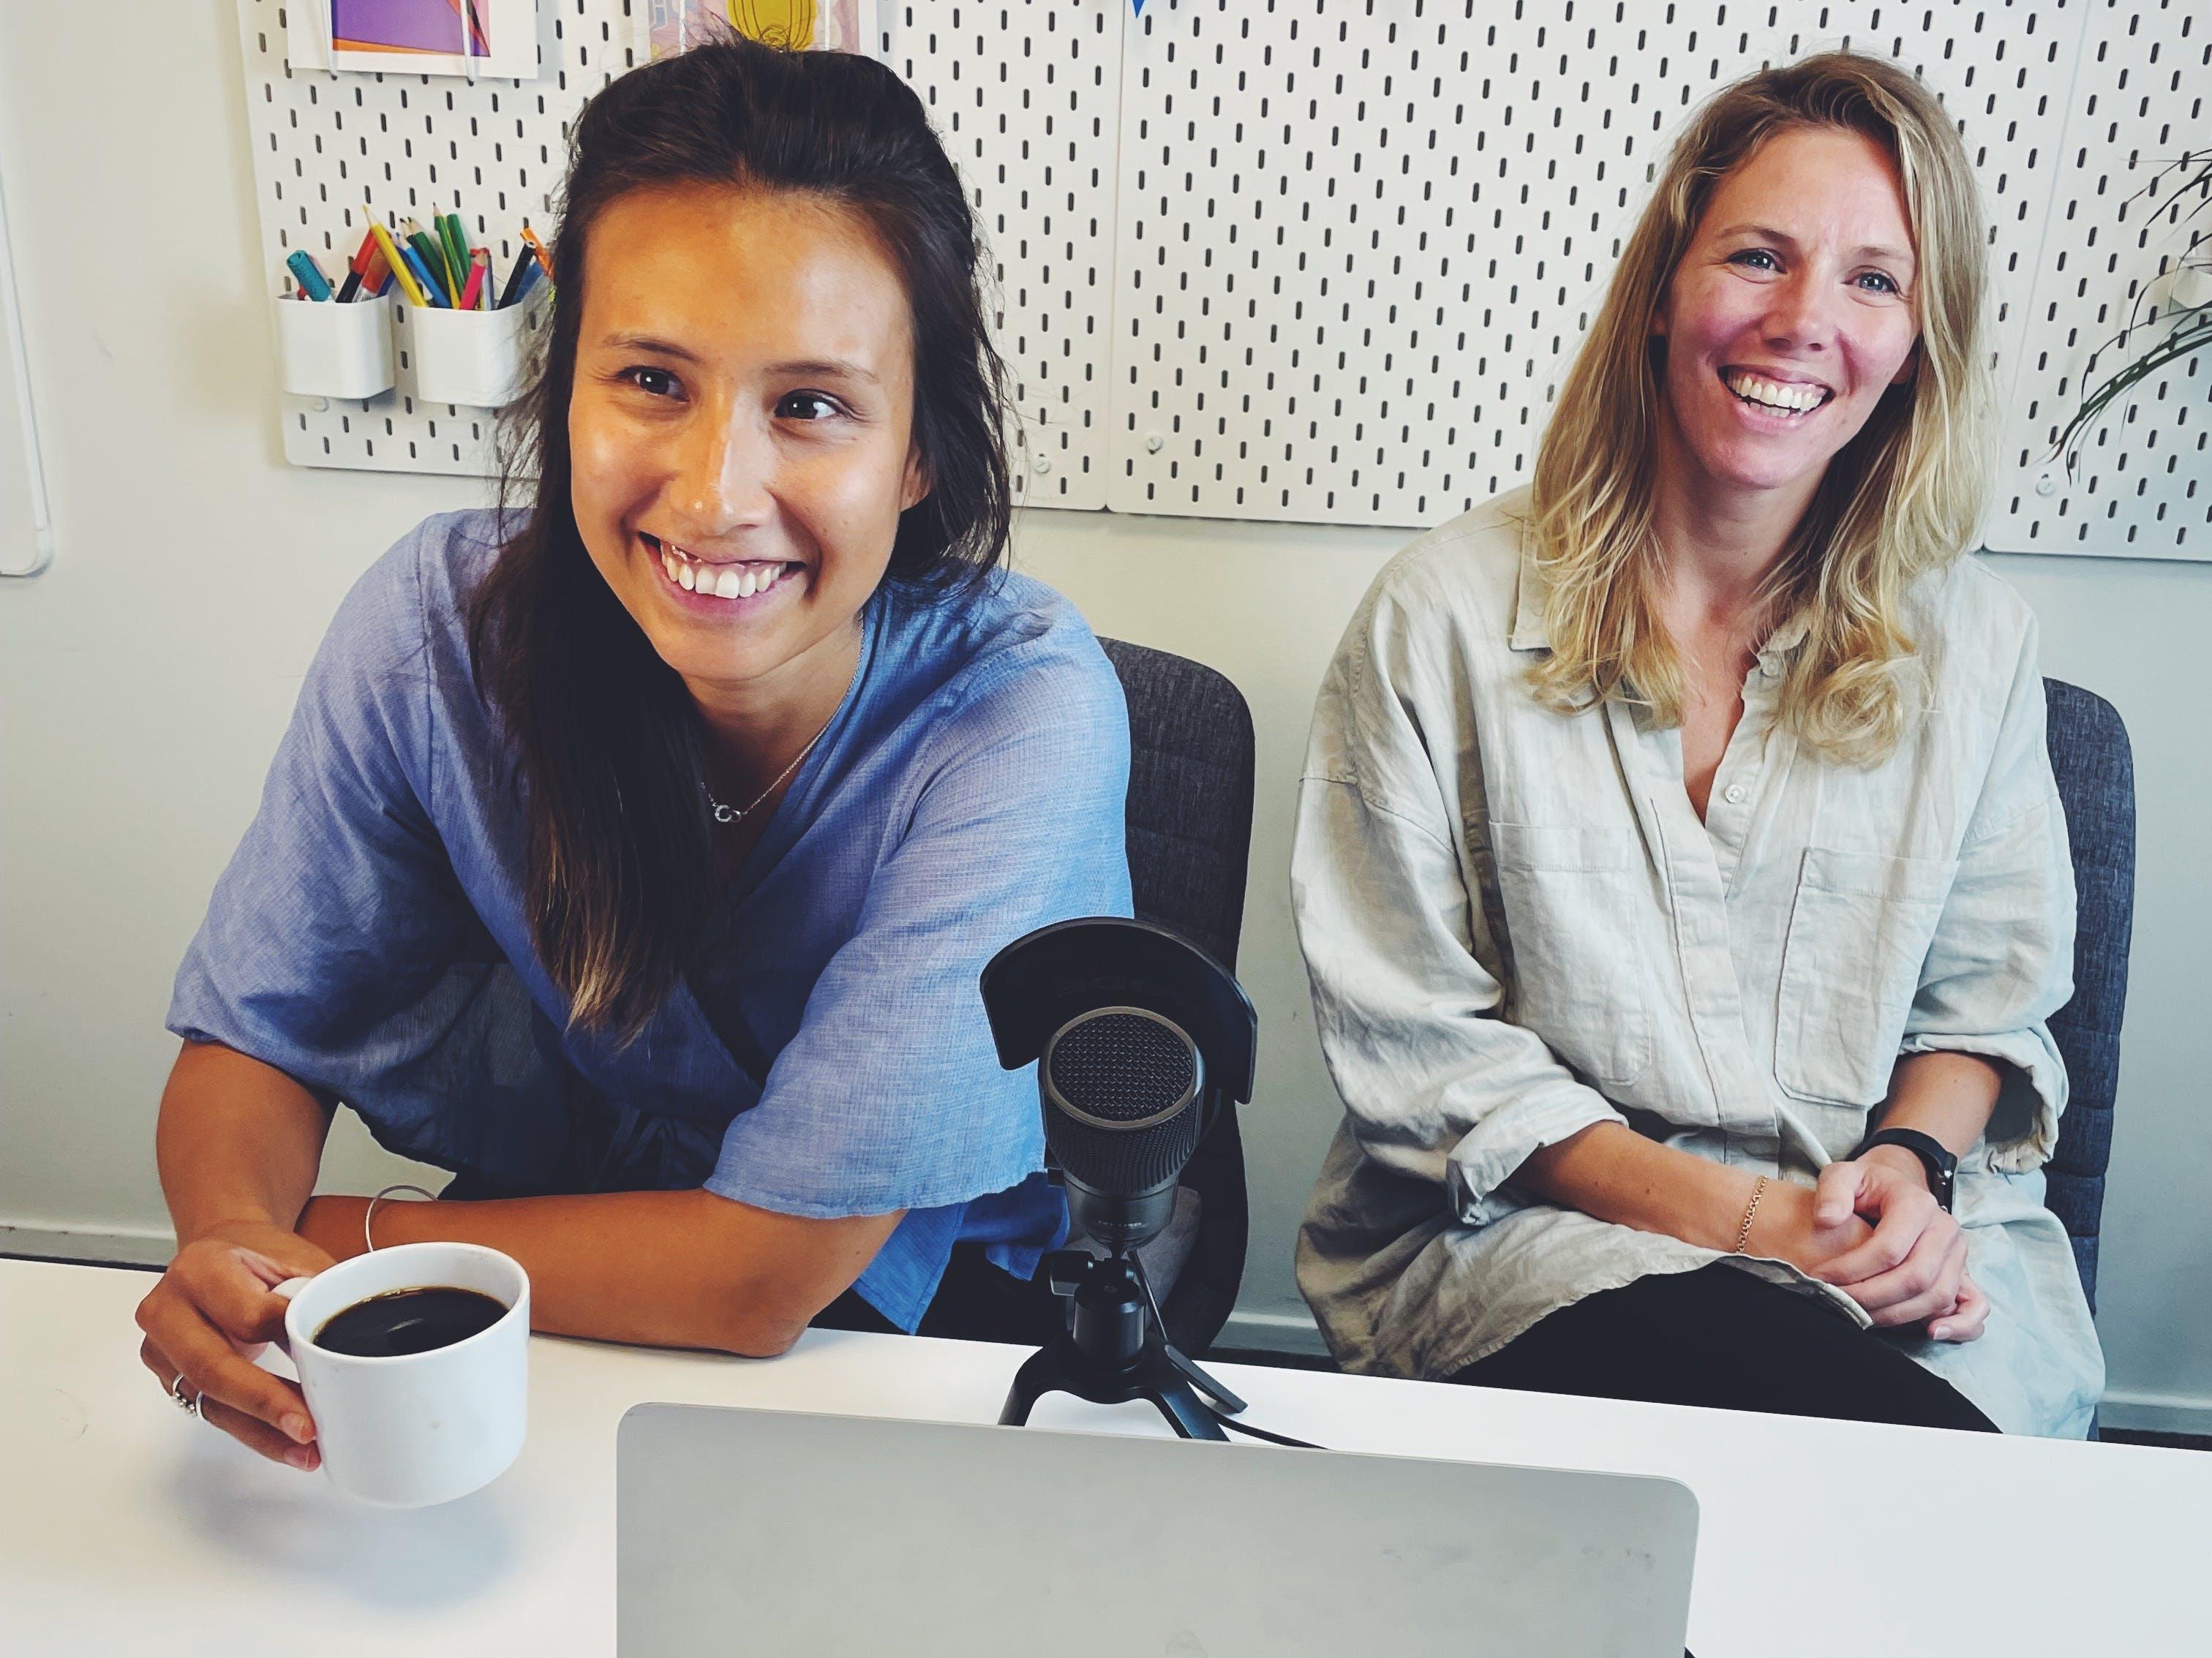 Sandra Hindskog and Jennie Dalgren having coffee